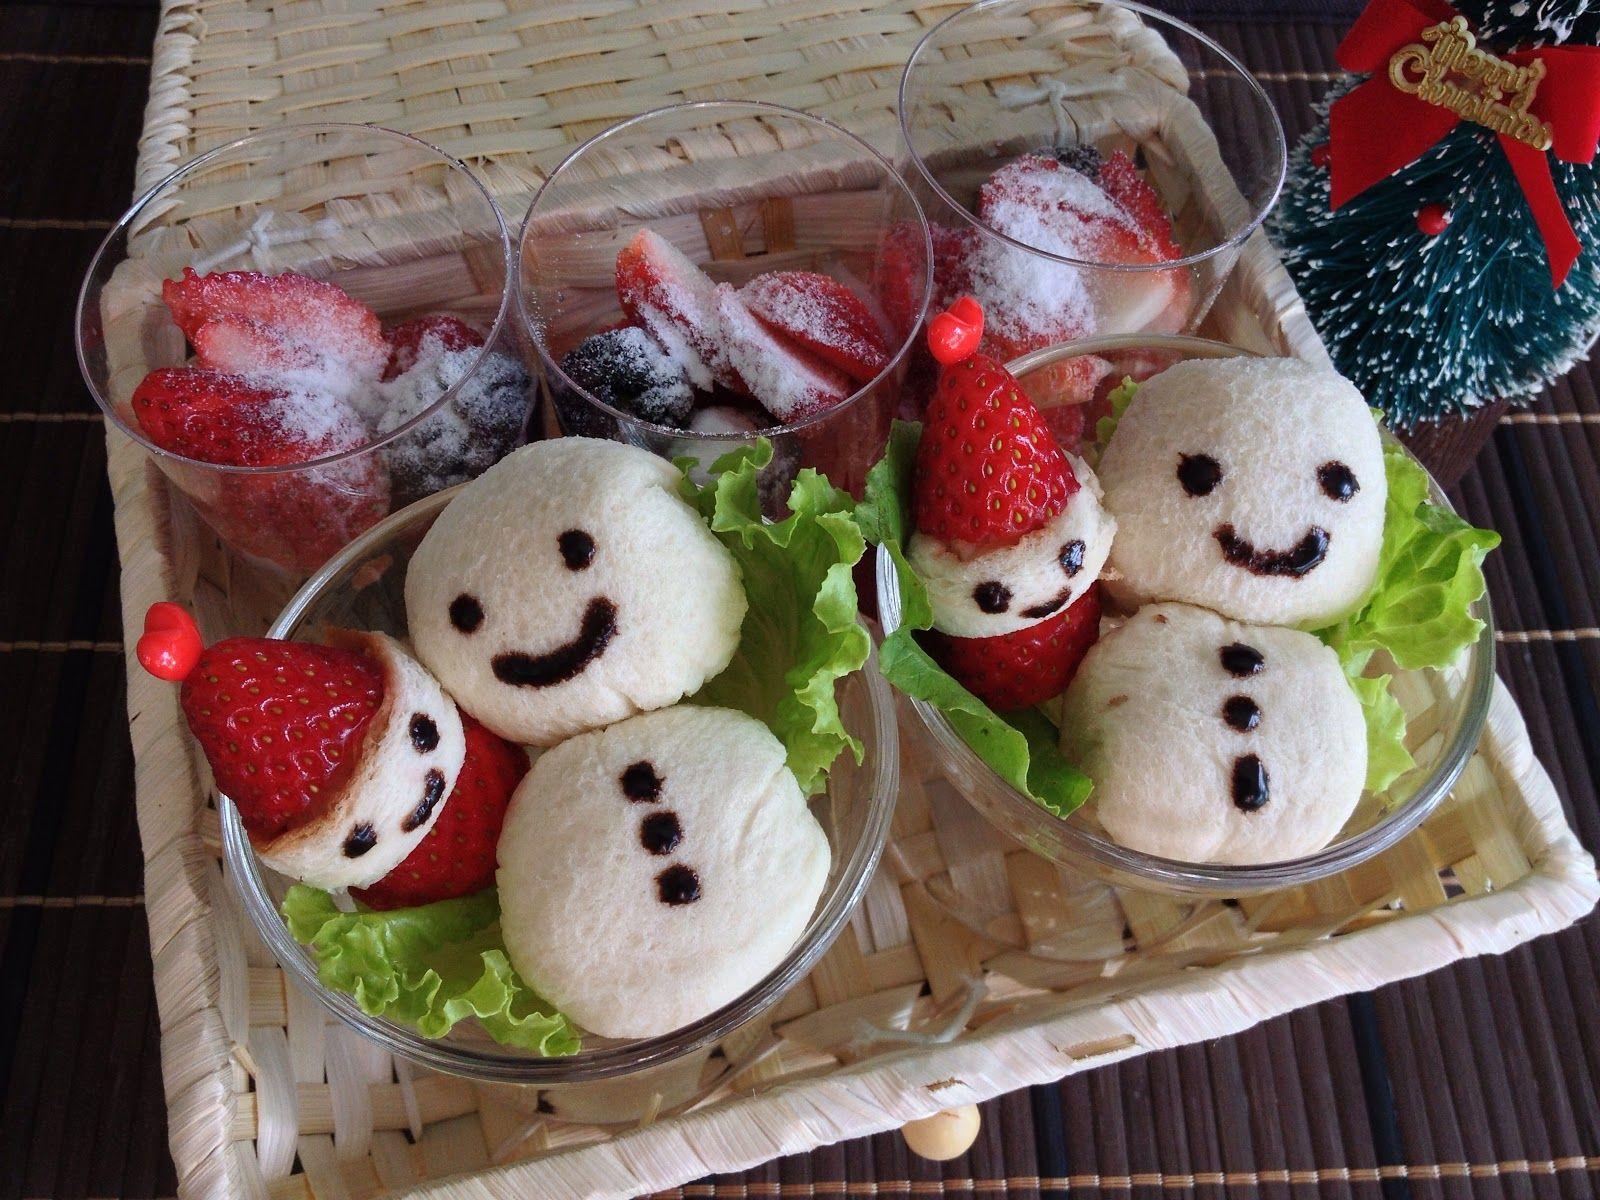 Snowman+and+Santa+Kyaraben+(3).JPG (1600×1200)